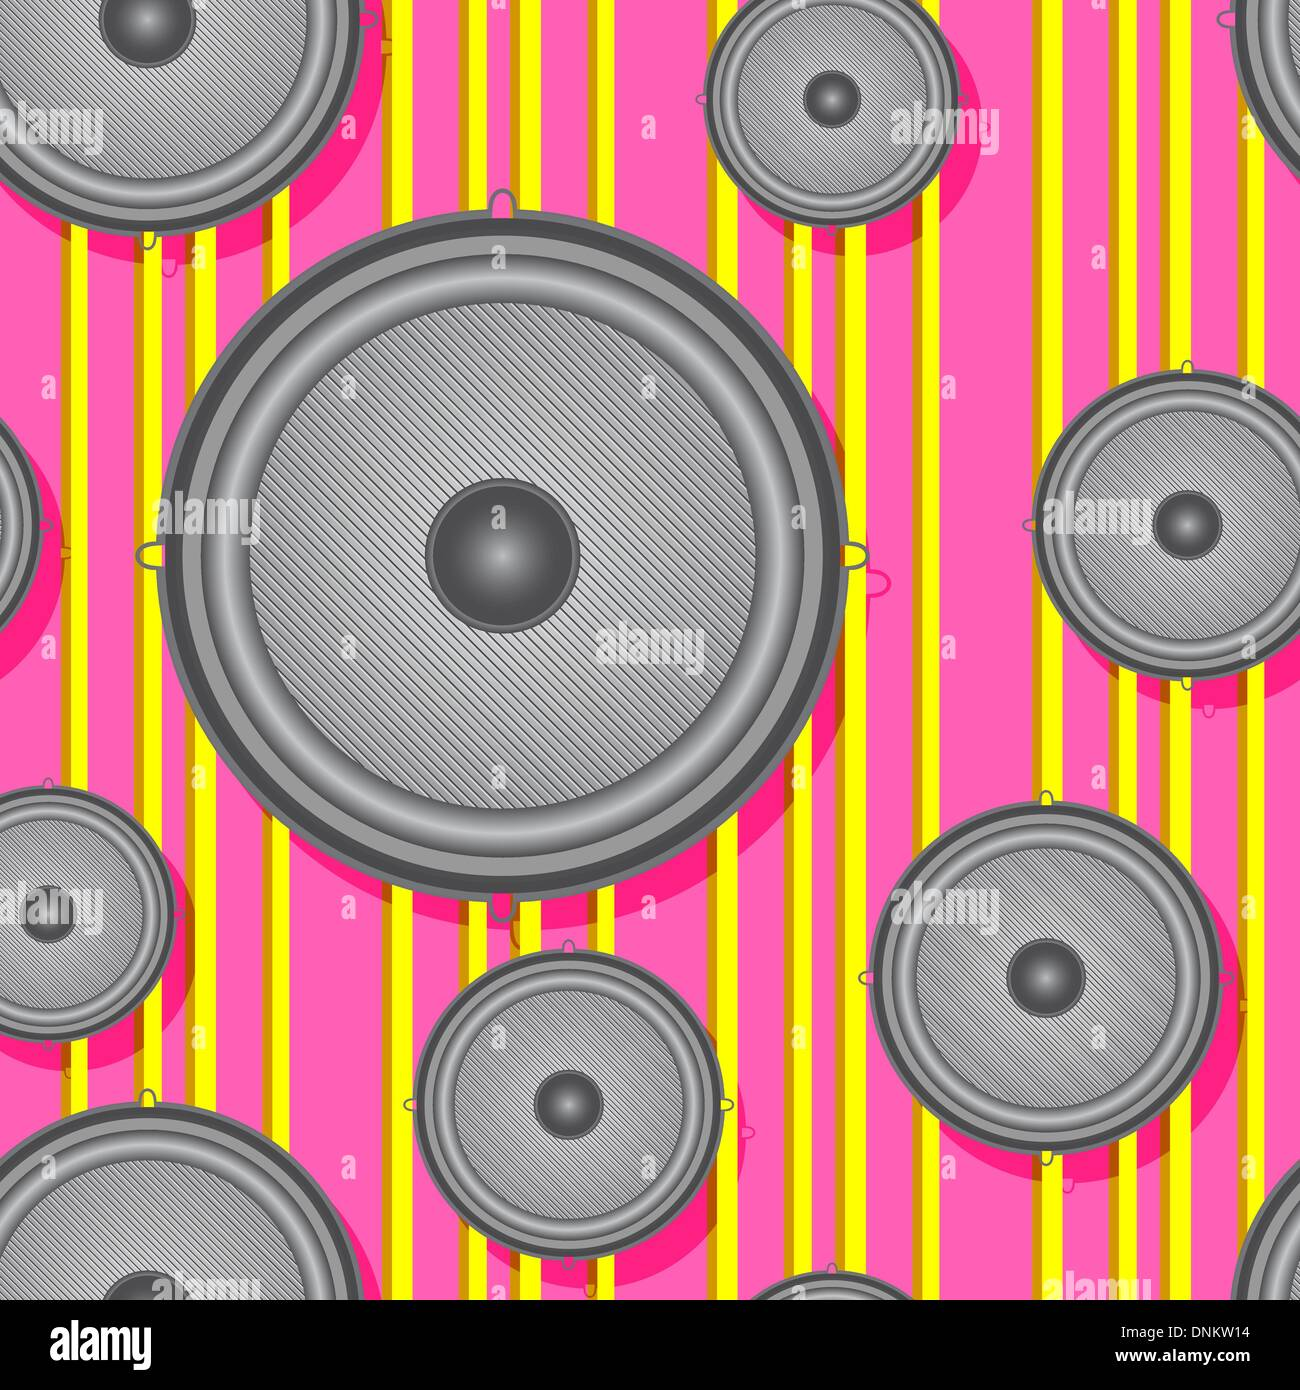 Lautsprecher nahtlose Hintergrund. Vektor-Illustration. Stock Vektor